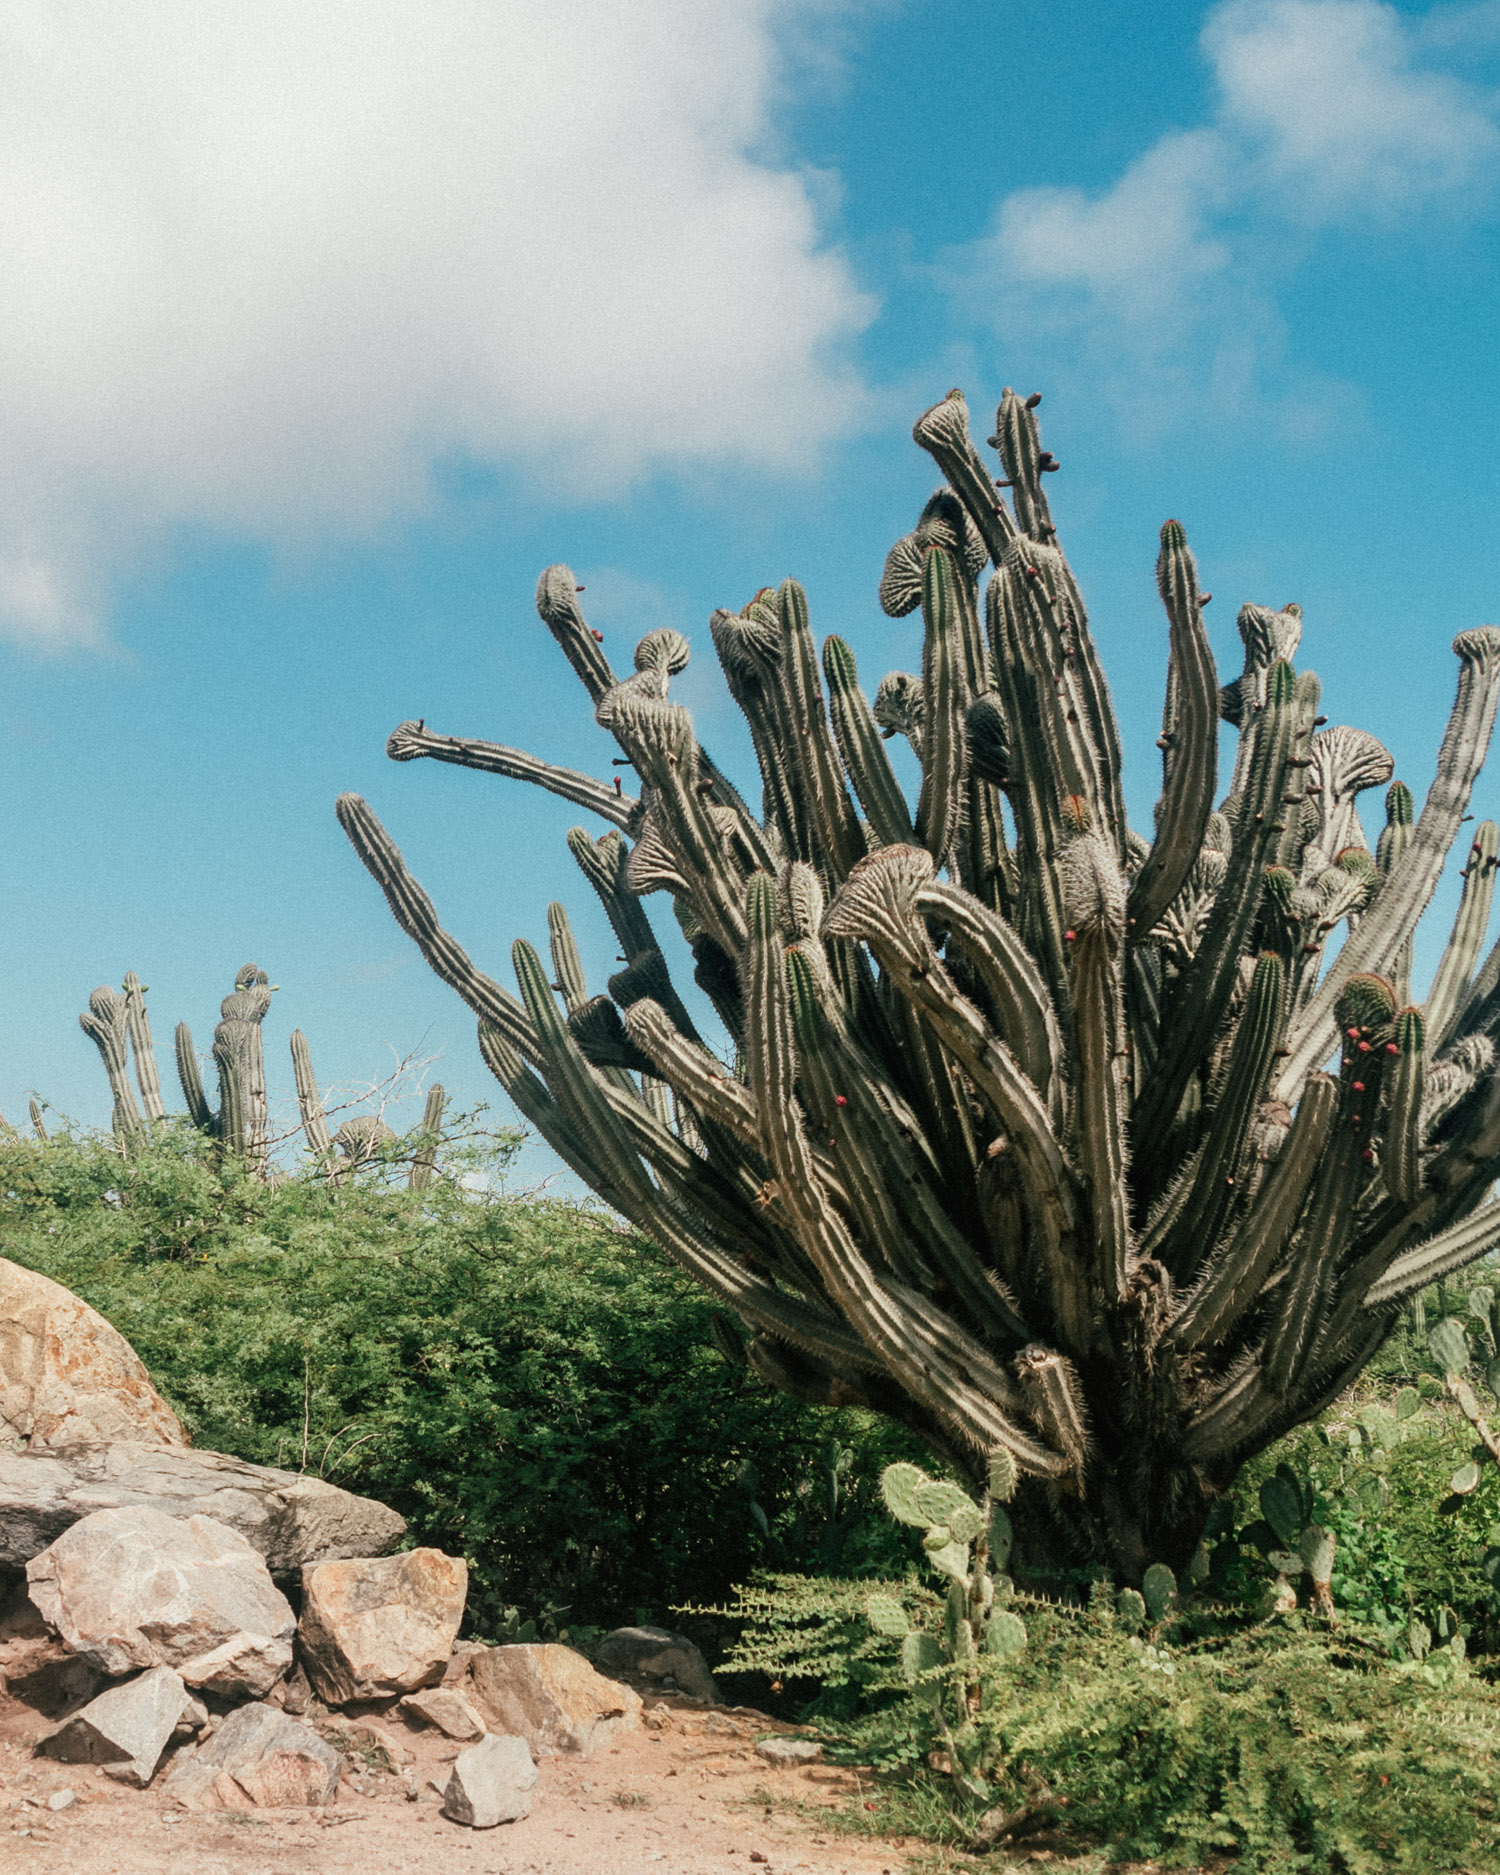 Cactus plants next to Alto Vista Chapel